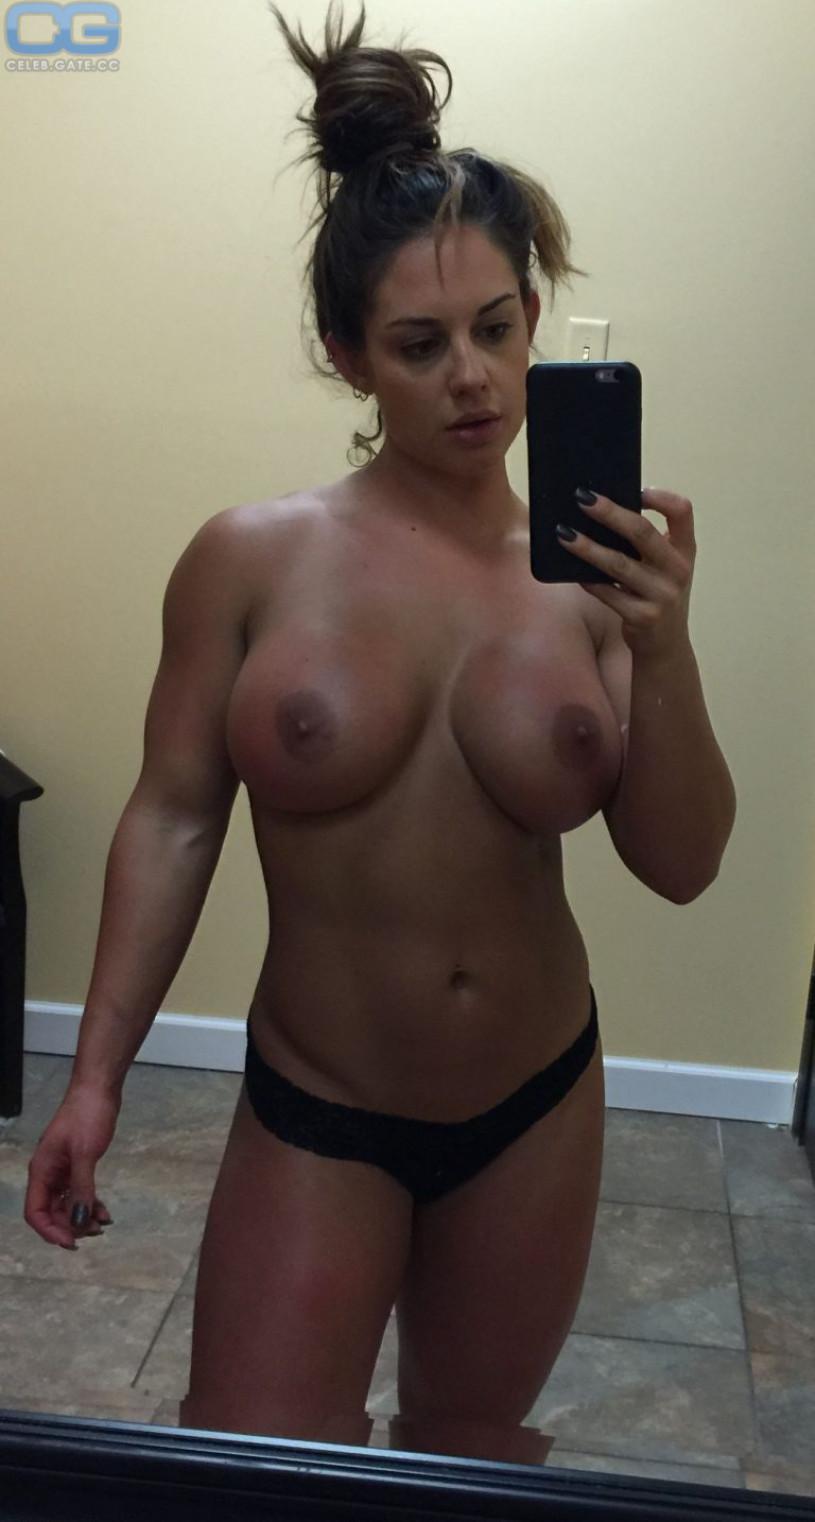 Teens celeste bonin sexy naked videos court charlotte